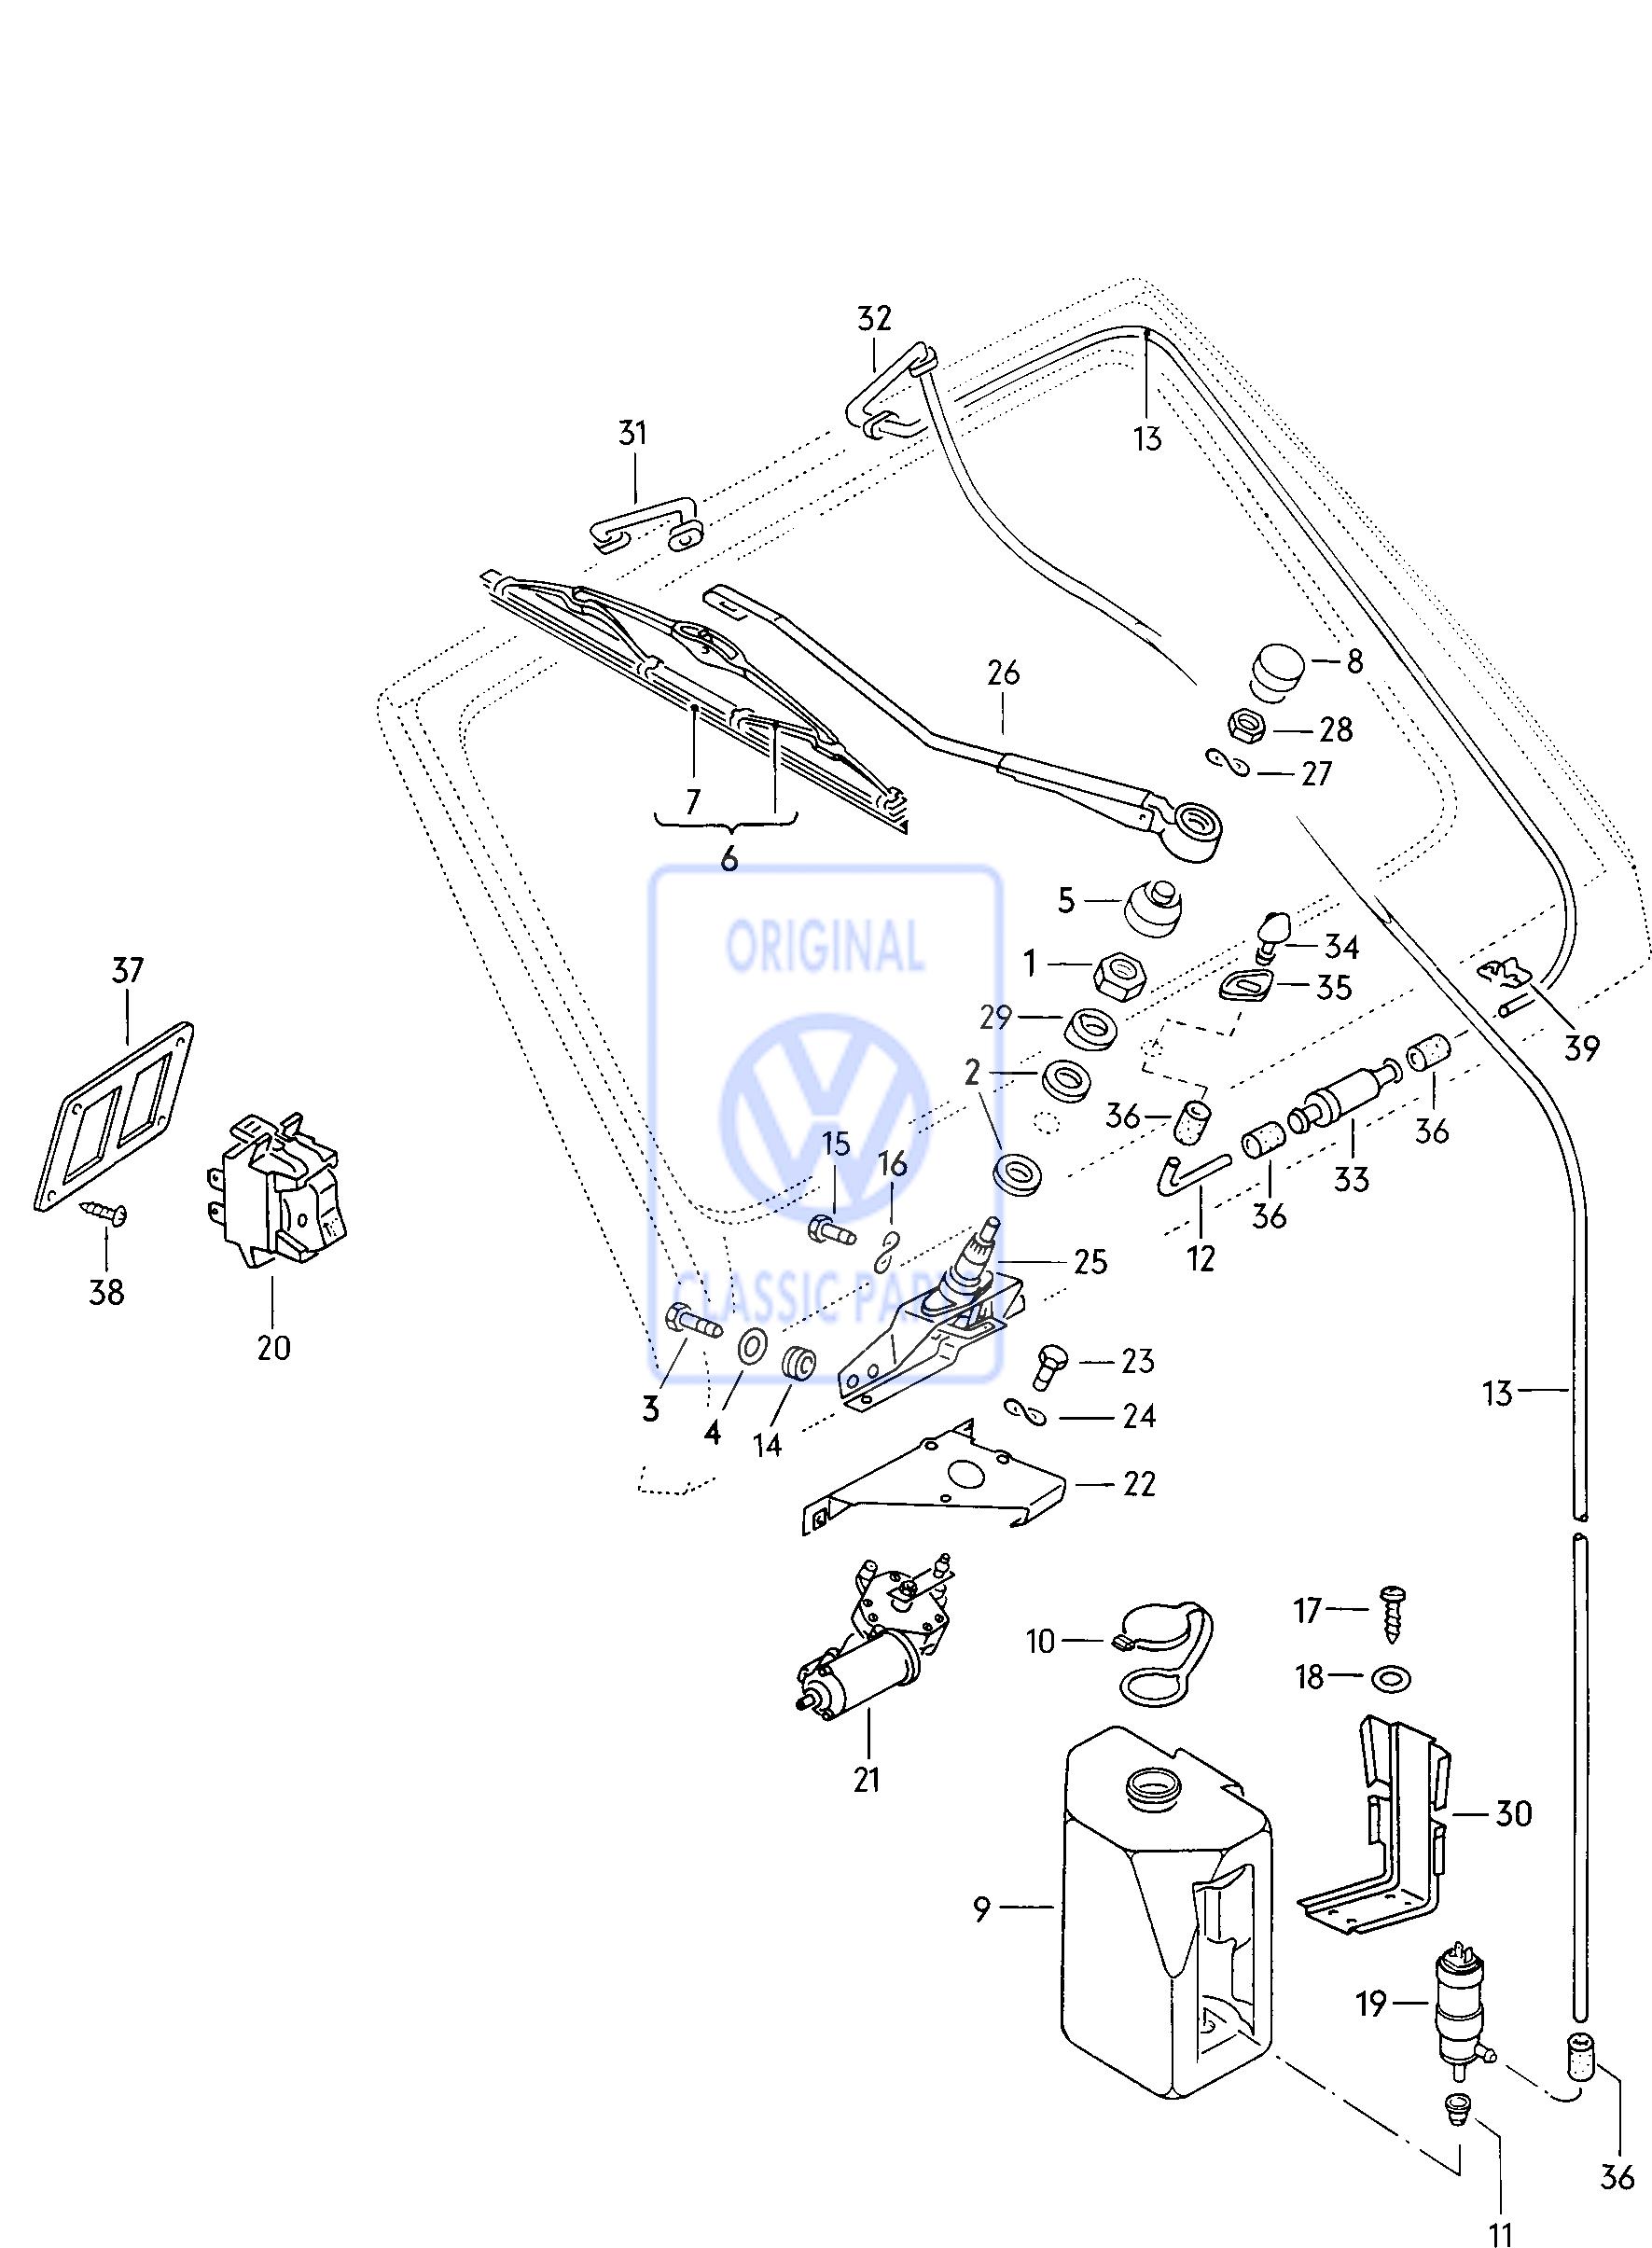 Astounding Touareg Headlight Wiring Diagram Auto Electrical Wiring Diagram Wiring Cloud Genionhyedimohammedshrineorg